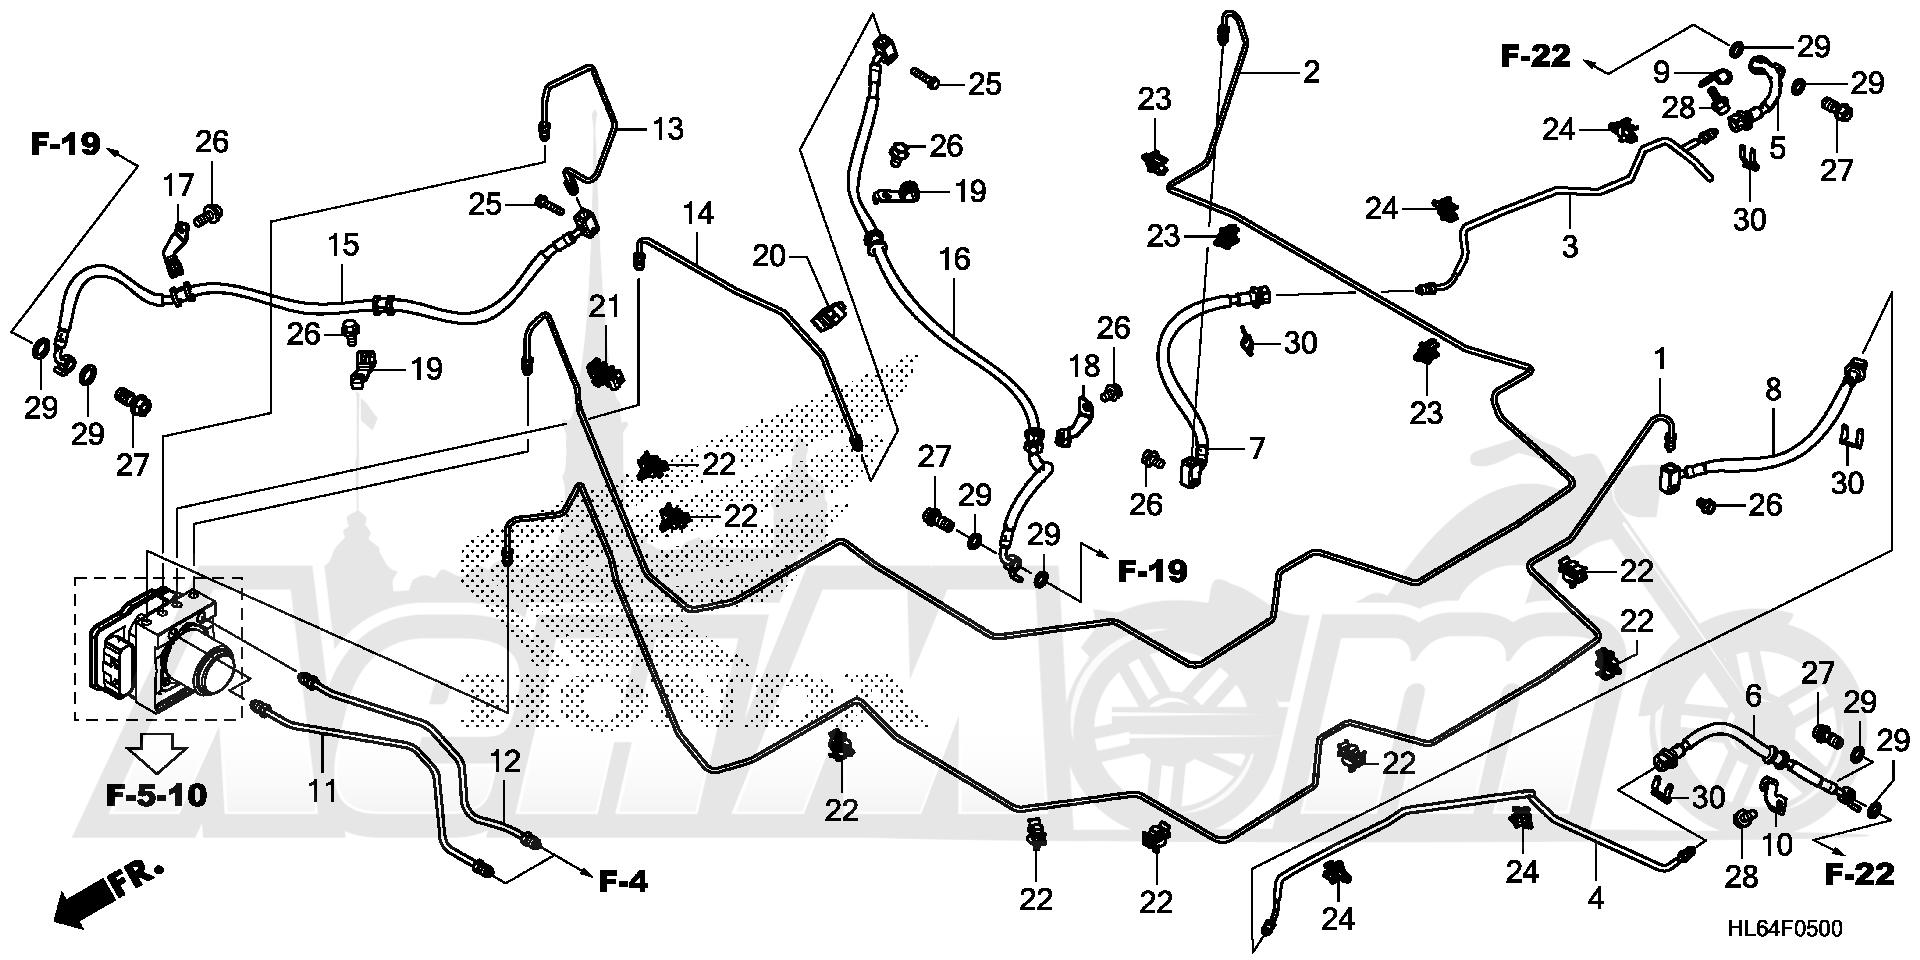 Запчасти для Квадроцикла Honda 2019 SXS1000S2X Раздел: BRAKE PIPE AND BRAKE HOSE (1) | тормоза труба и тормоза шланг (1)